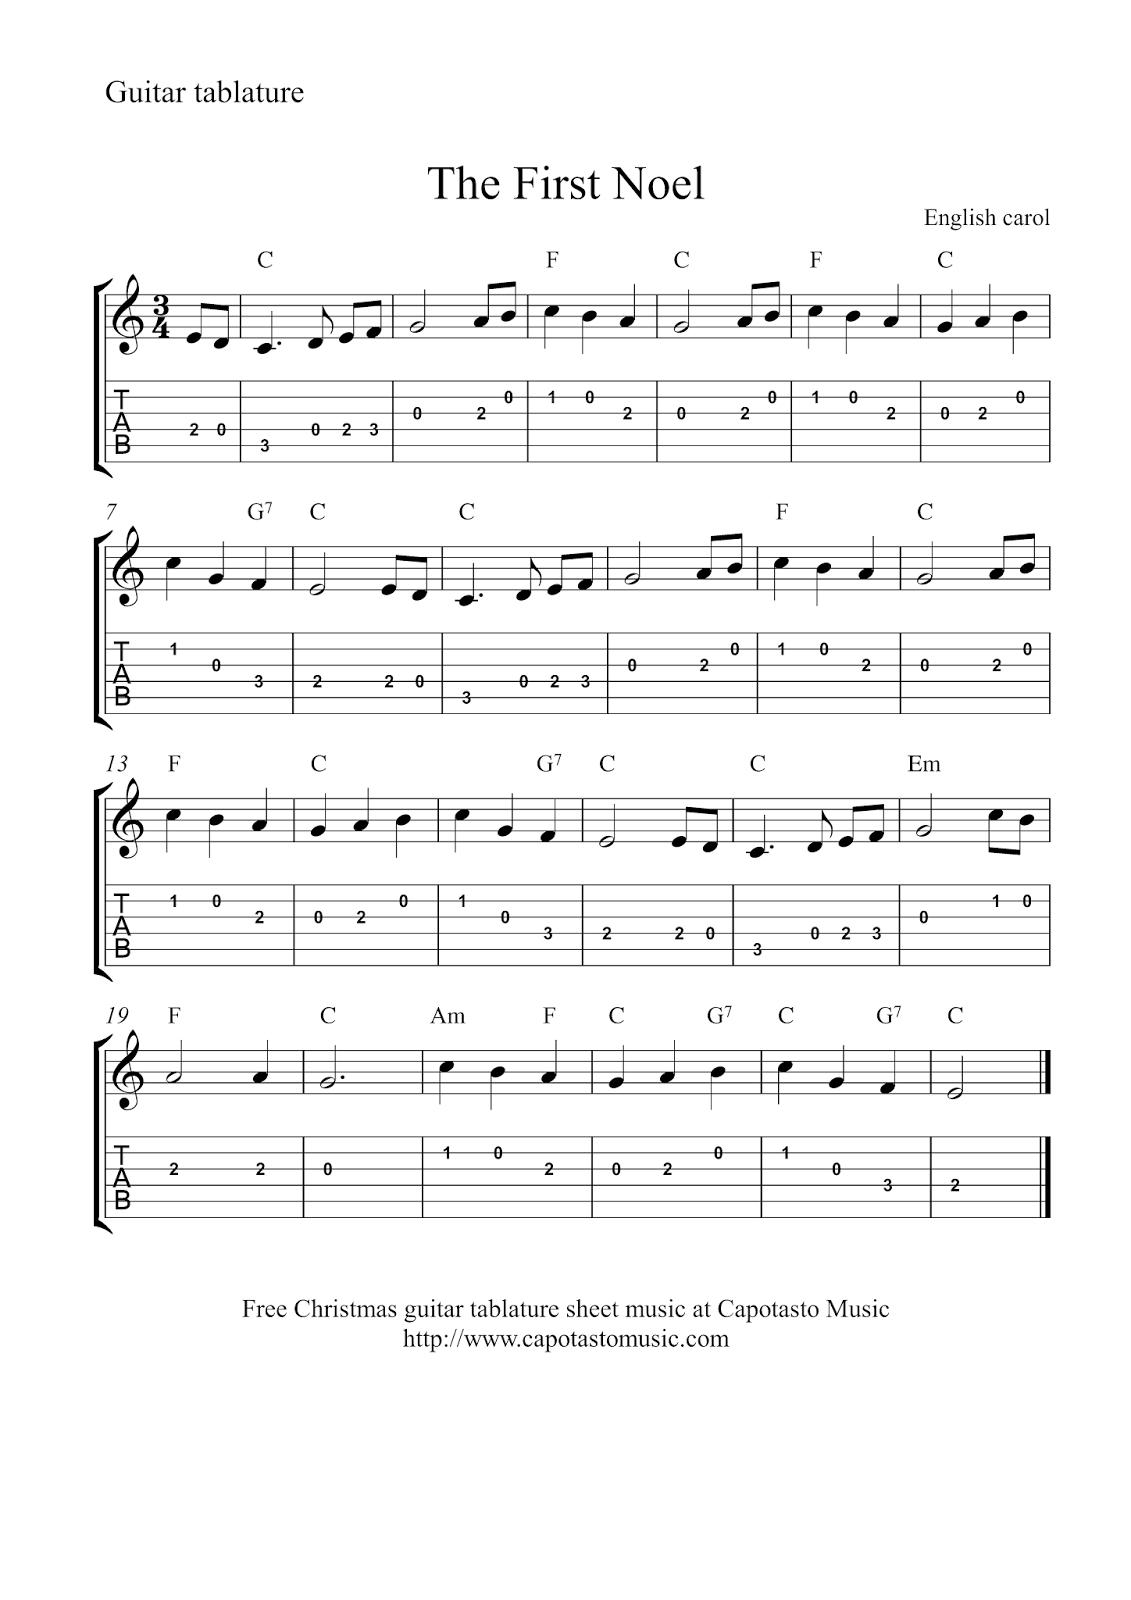 Free Sheet Music Scores: Guitar Tab Christmas | Music In 2019 - Free Guitar Sheet Music For Popular Songs Printable